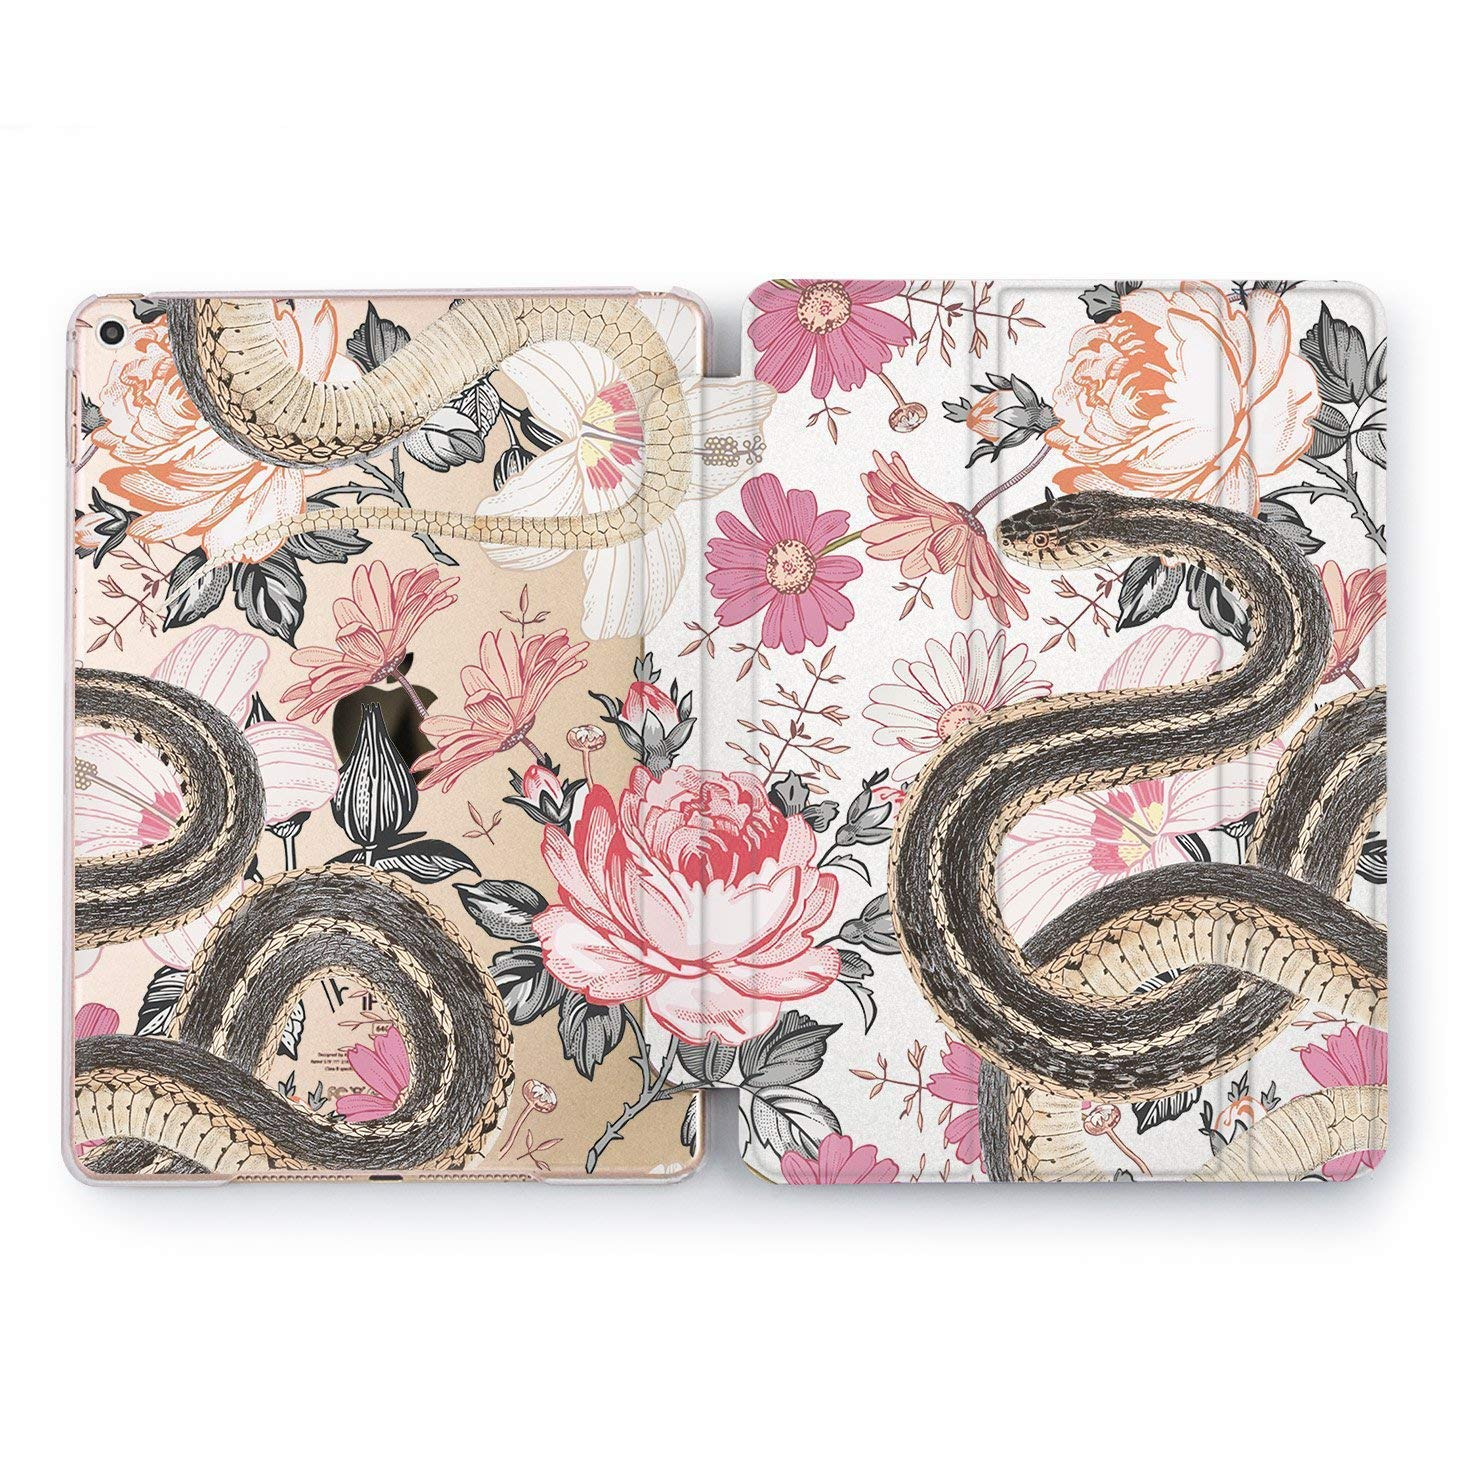 Doodle Sticker Case Smart Cover 9.7 iPad Pro 10.5 Magnetic Mini 4 Pro 12.9 Air